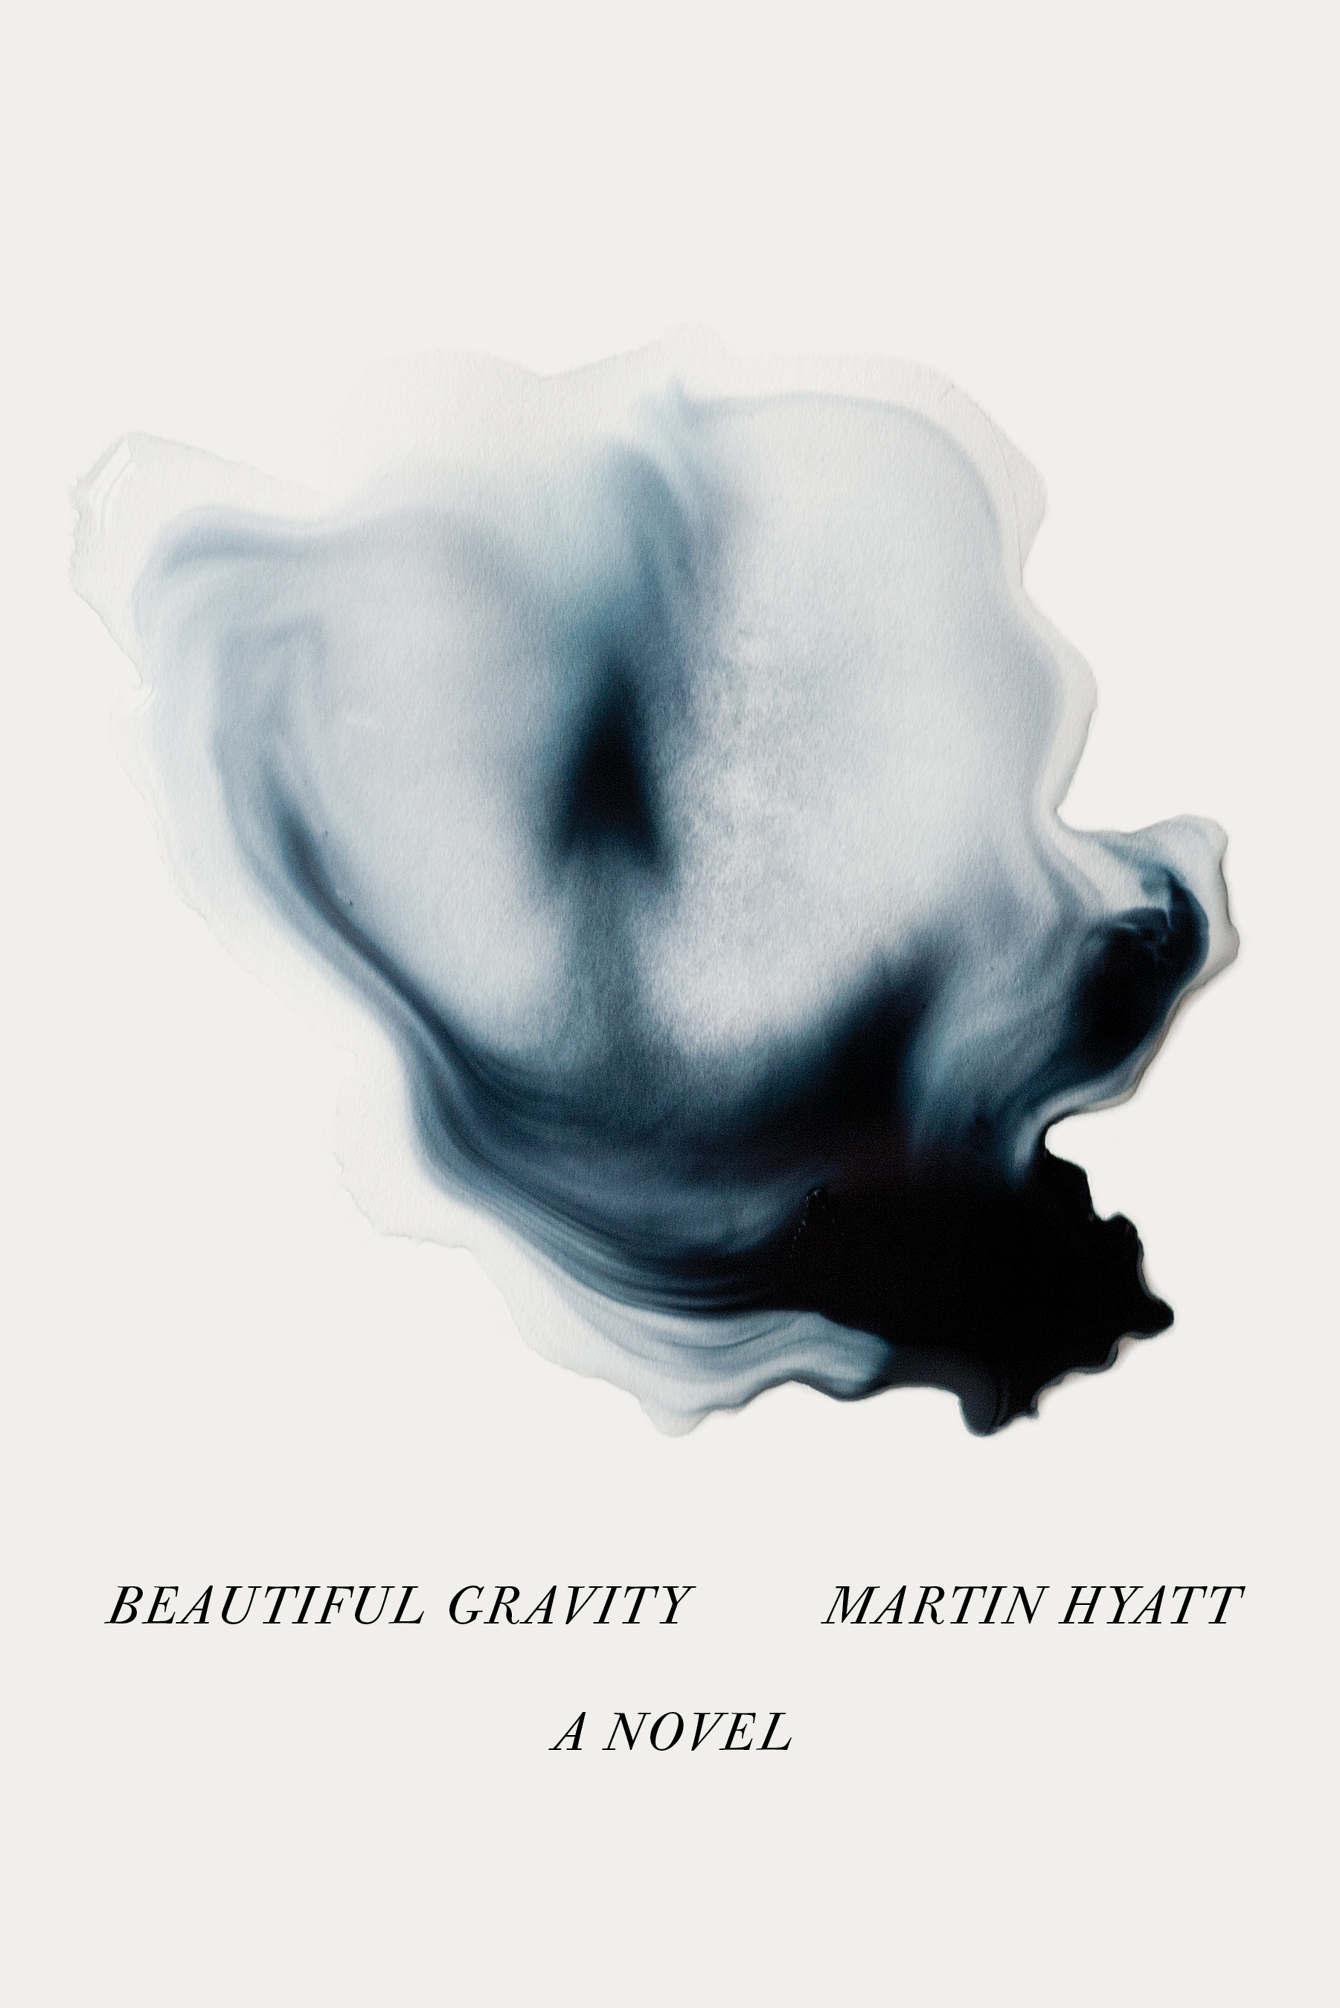 Beautiful-Gravity-cover_1340_c.jpg